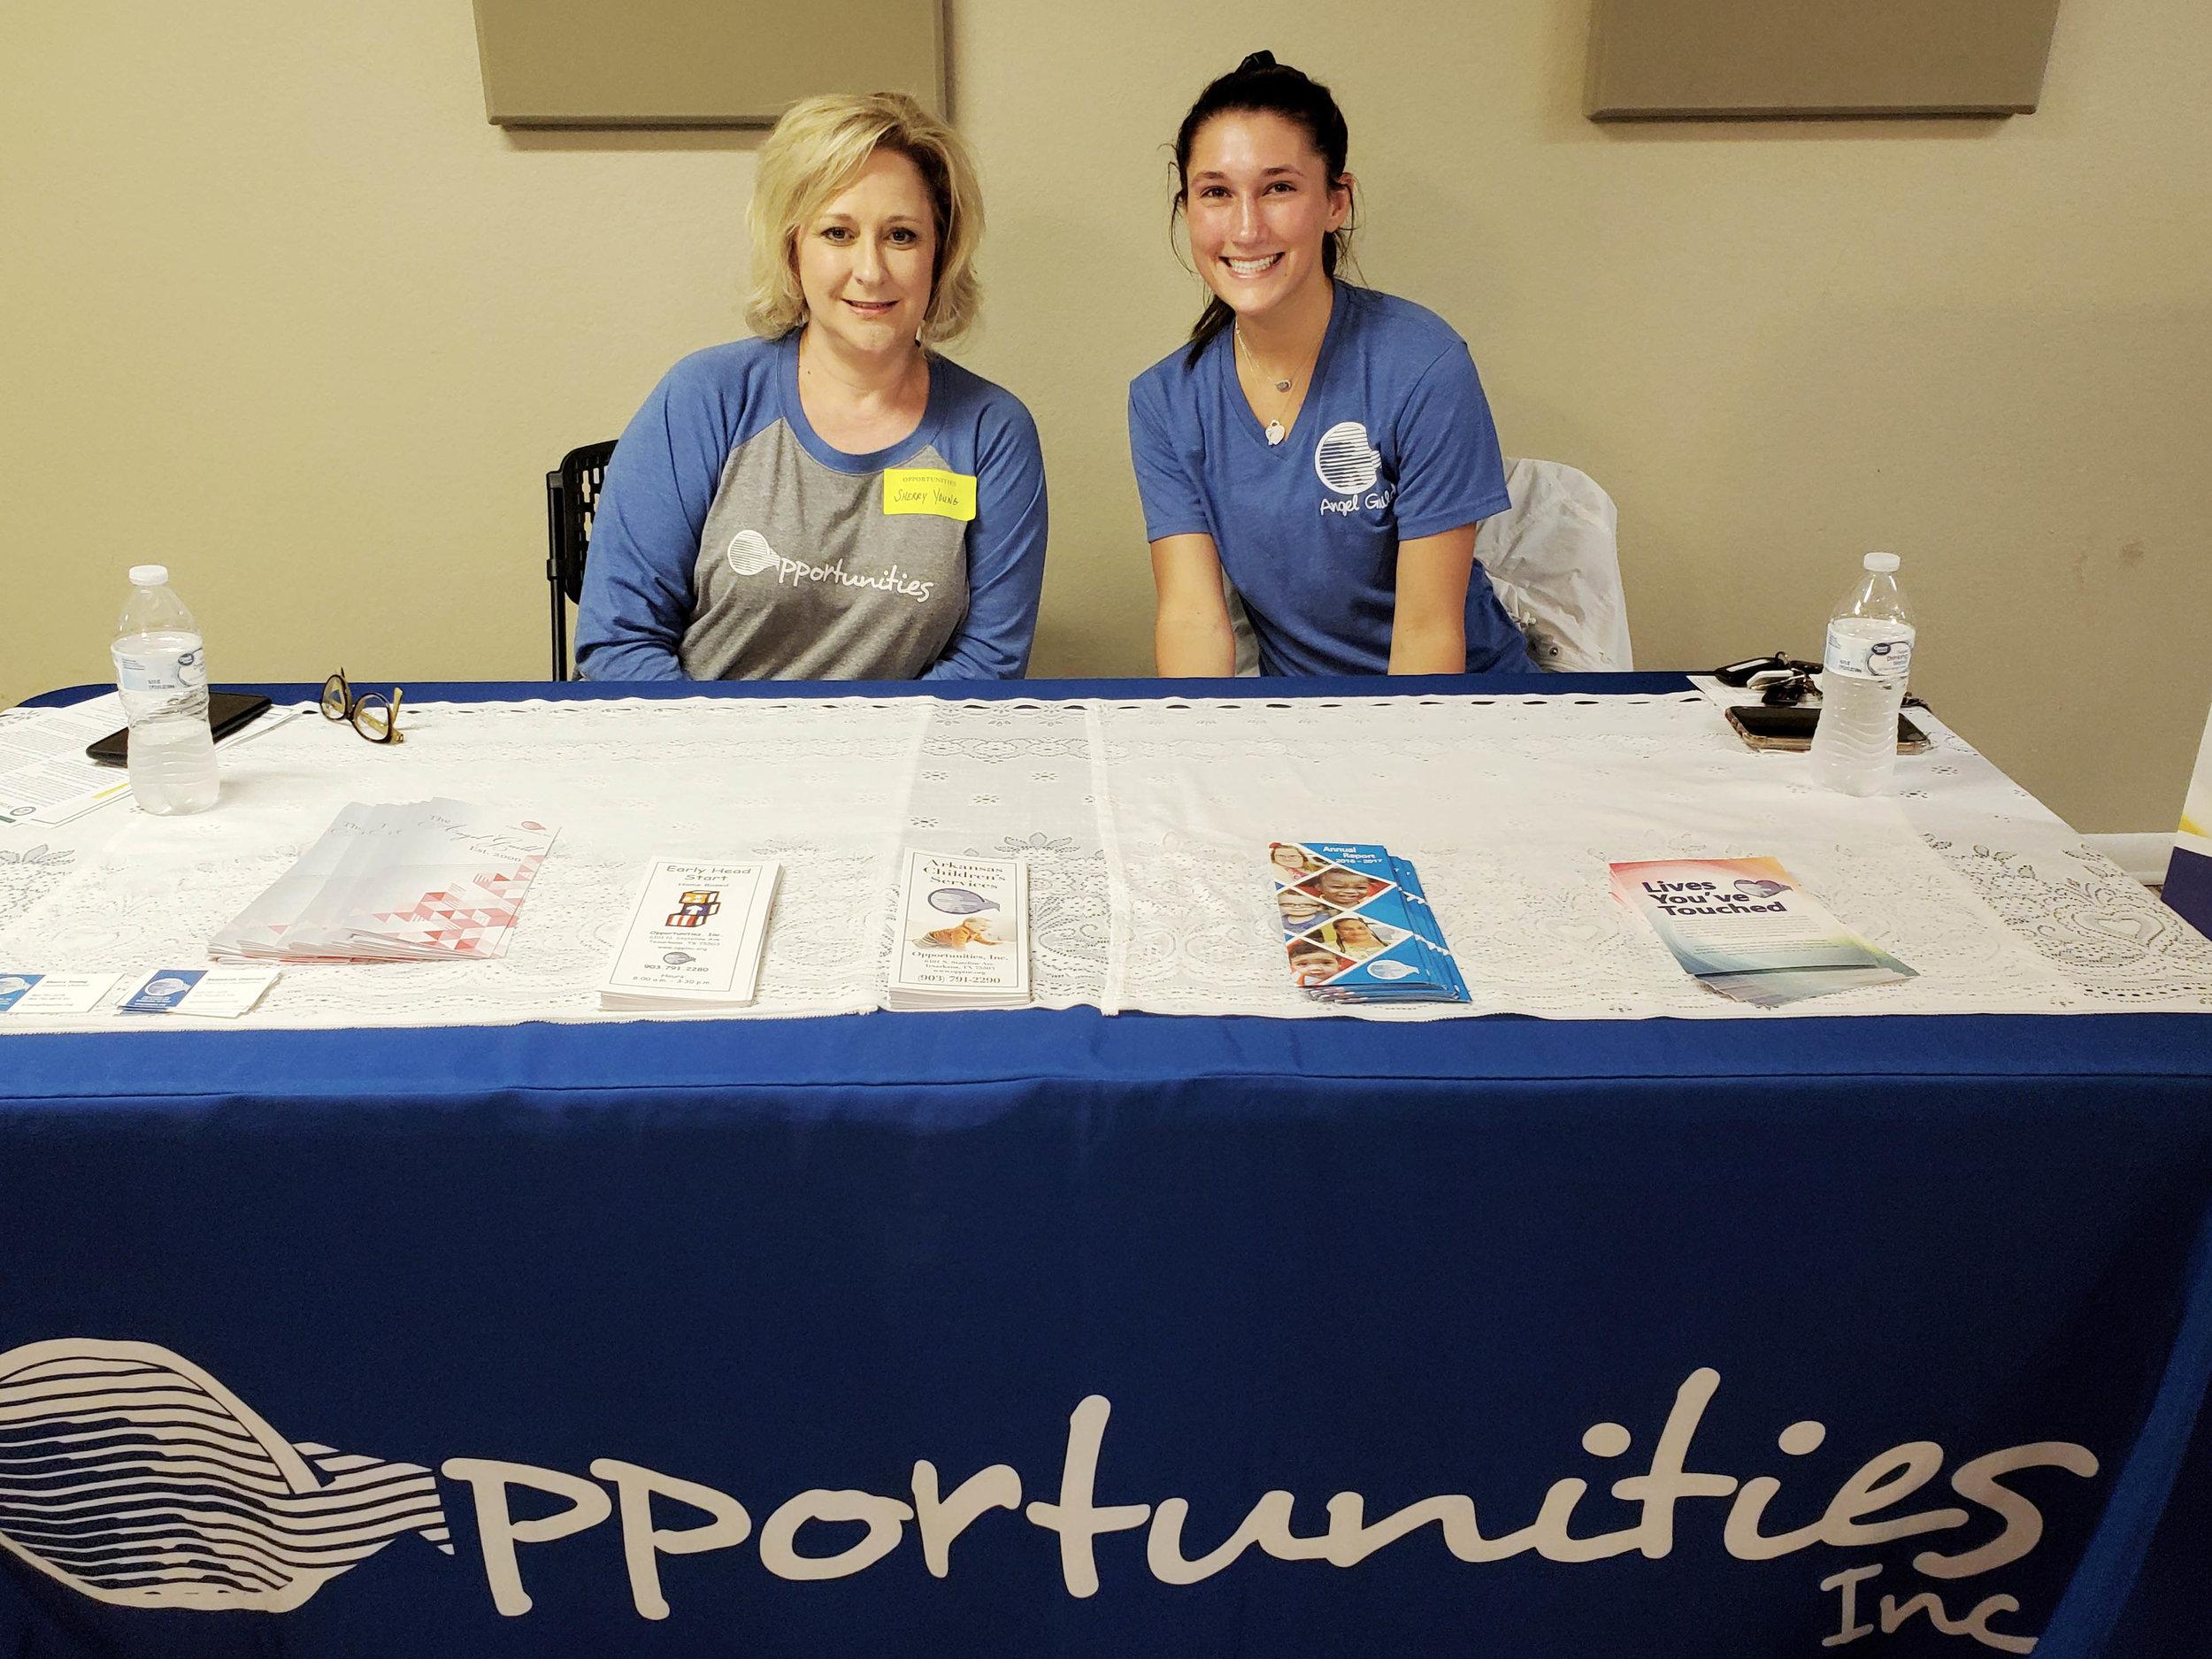 Sherri Young and Rebekah Drennon – Opportunities, Inc.